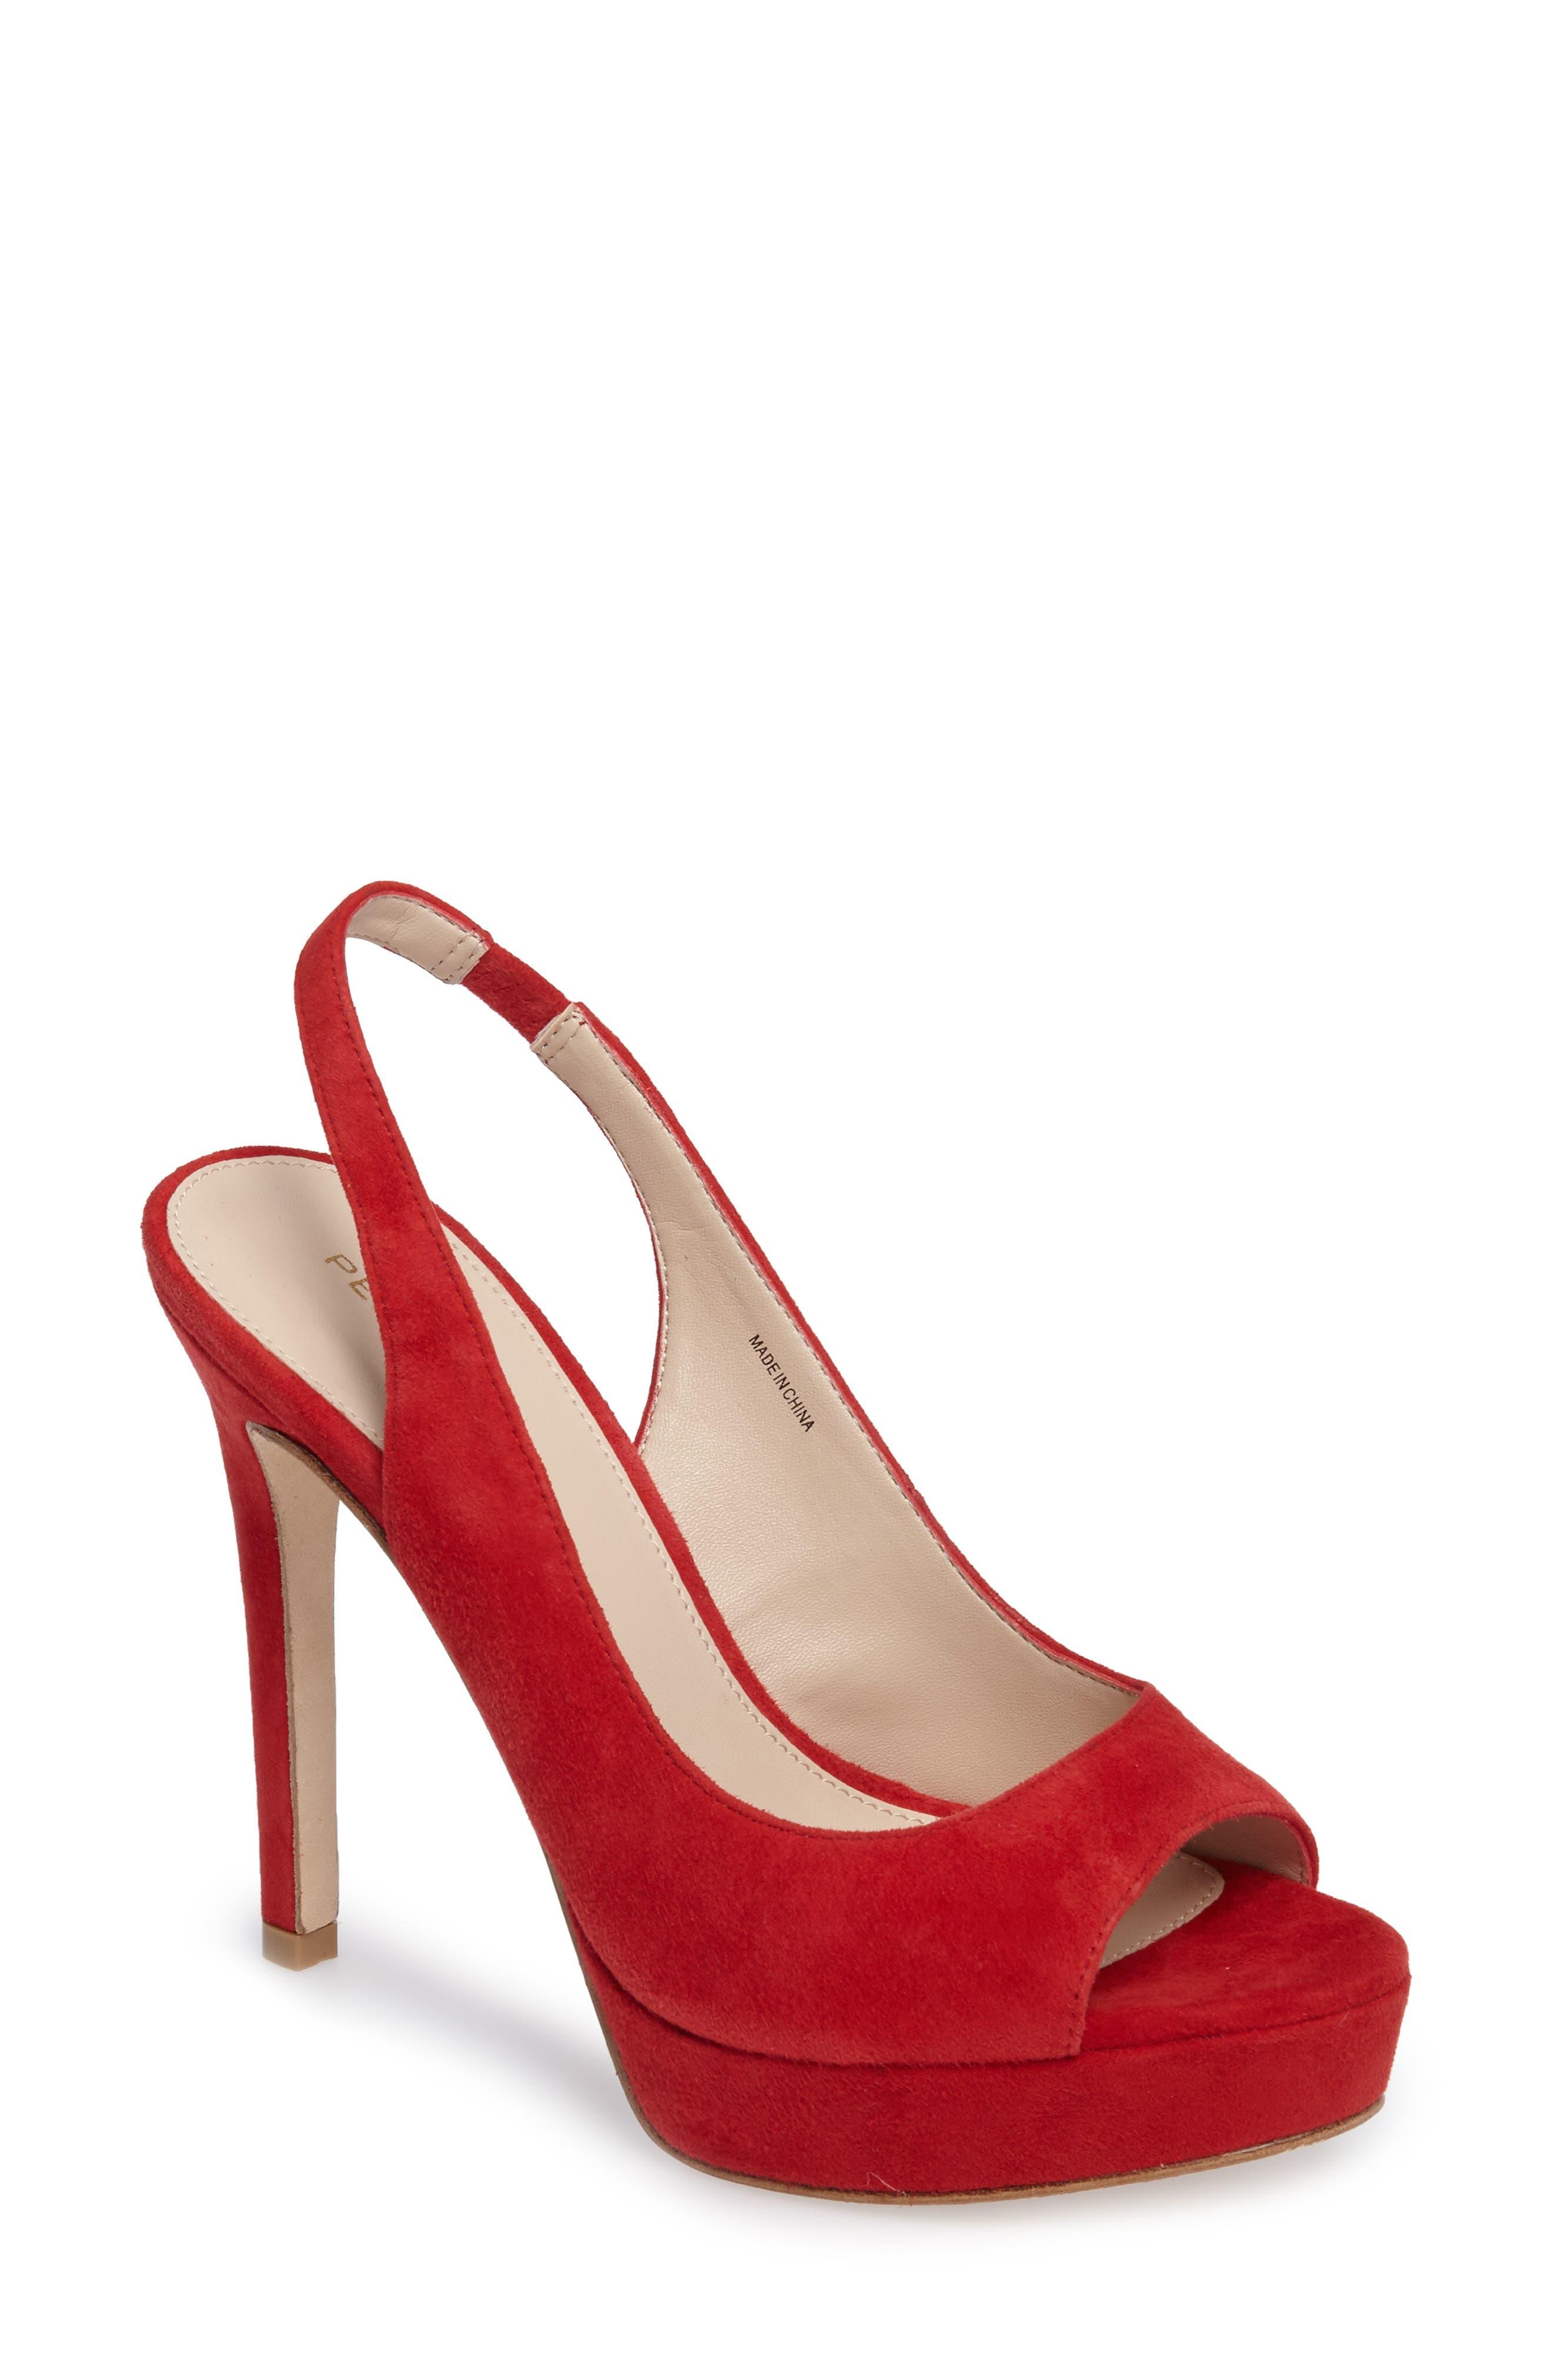 Main Image - Pelle Moda Oana Slingback Platform Sandal (Women)